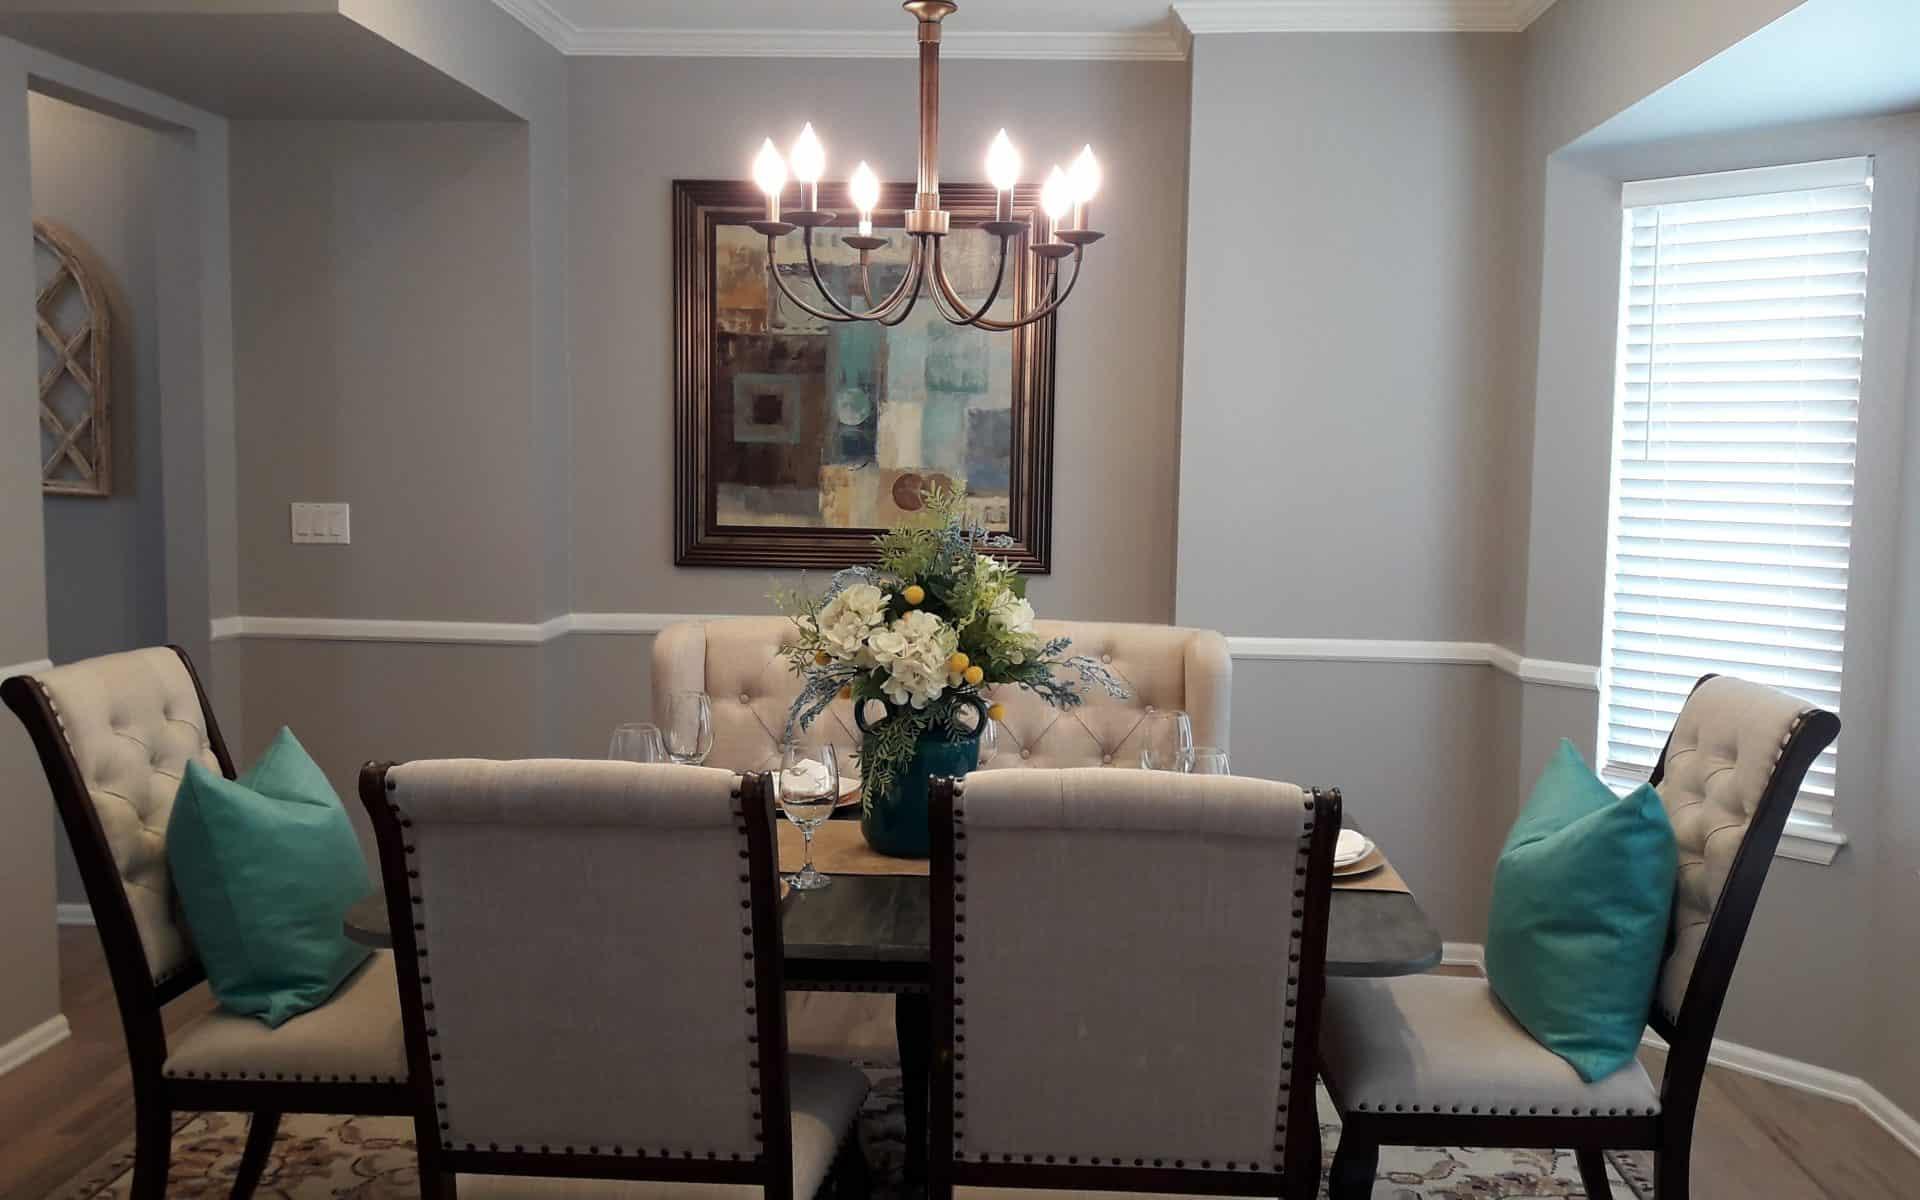 Dining room interior design after